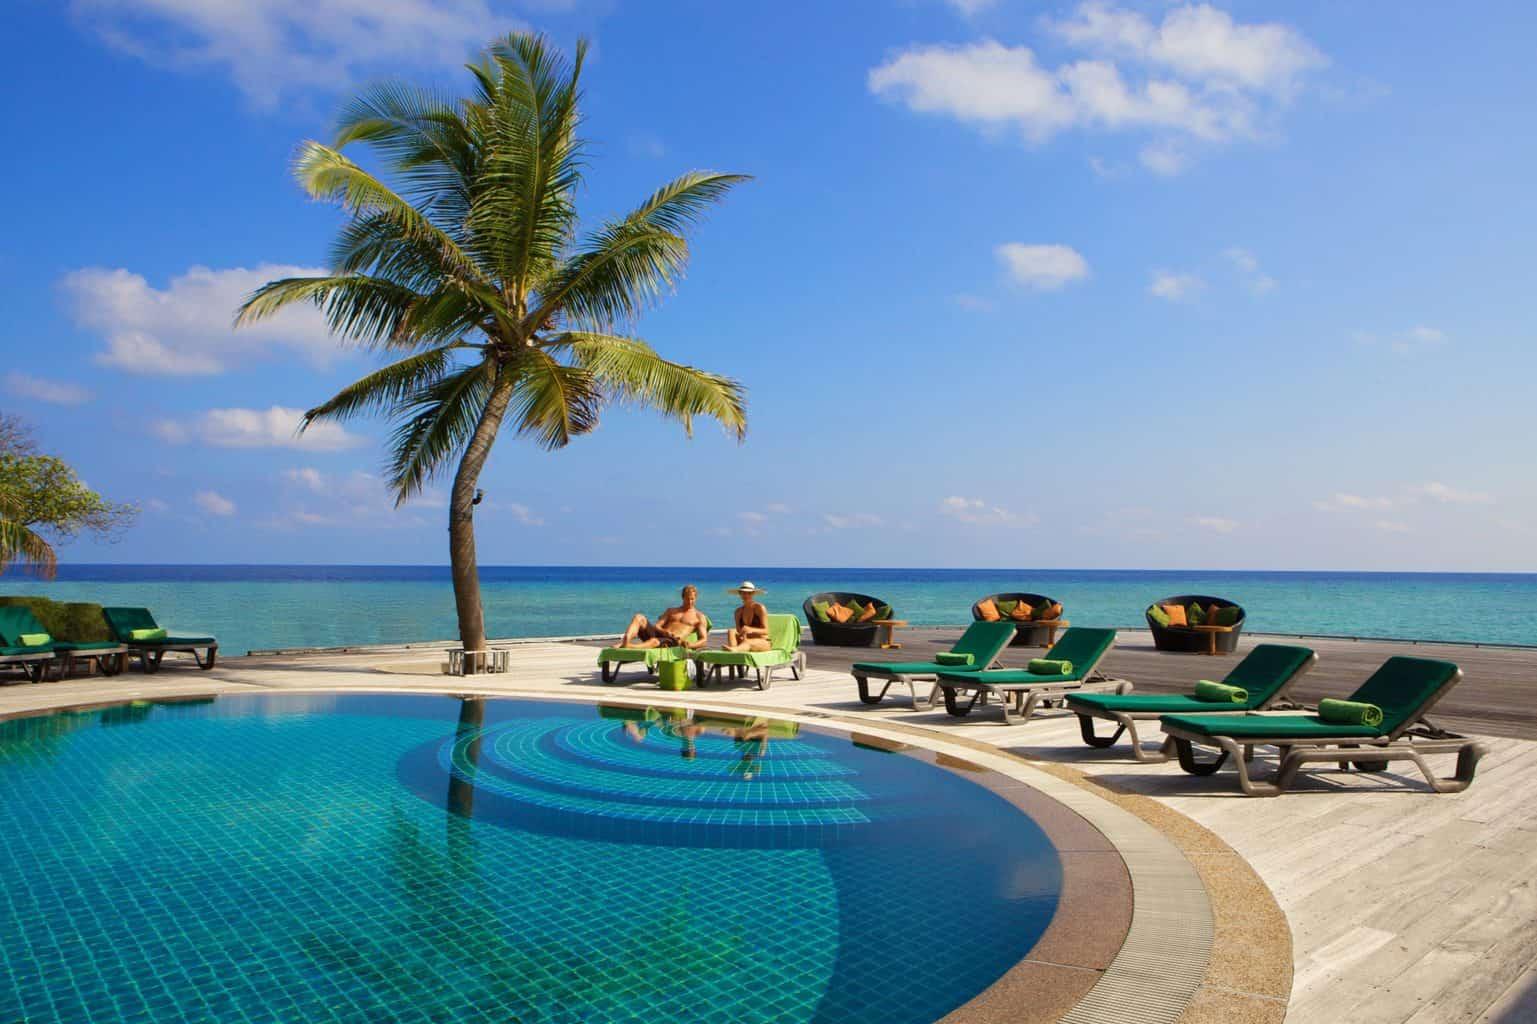 aldives Diving Holidays Kuredu Resort